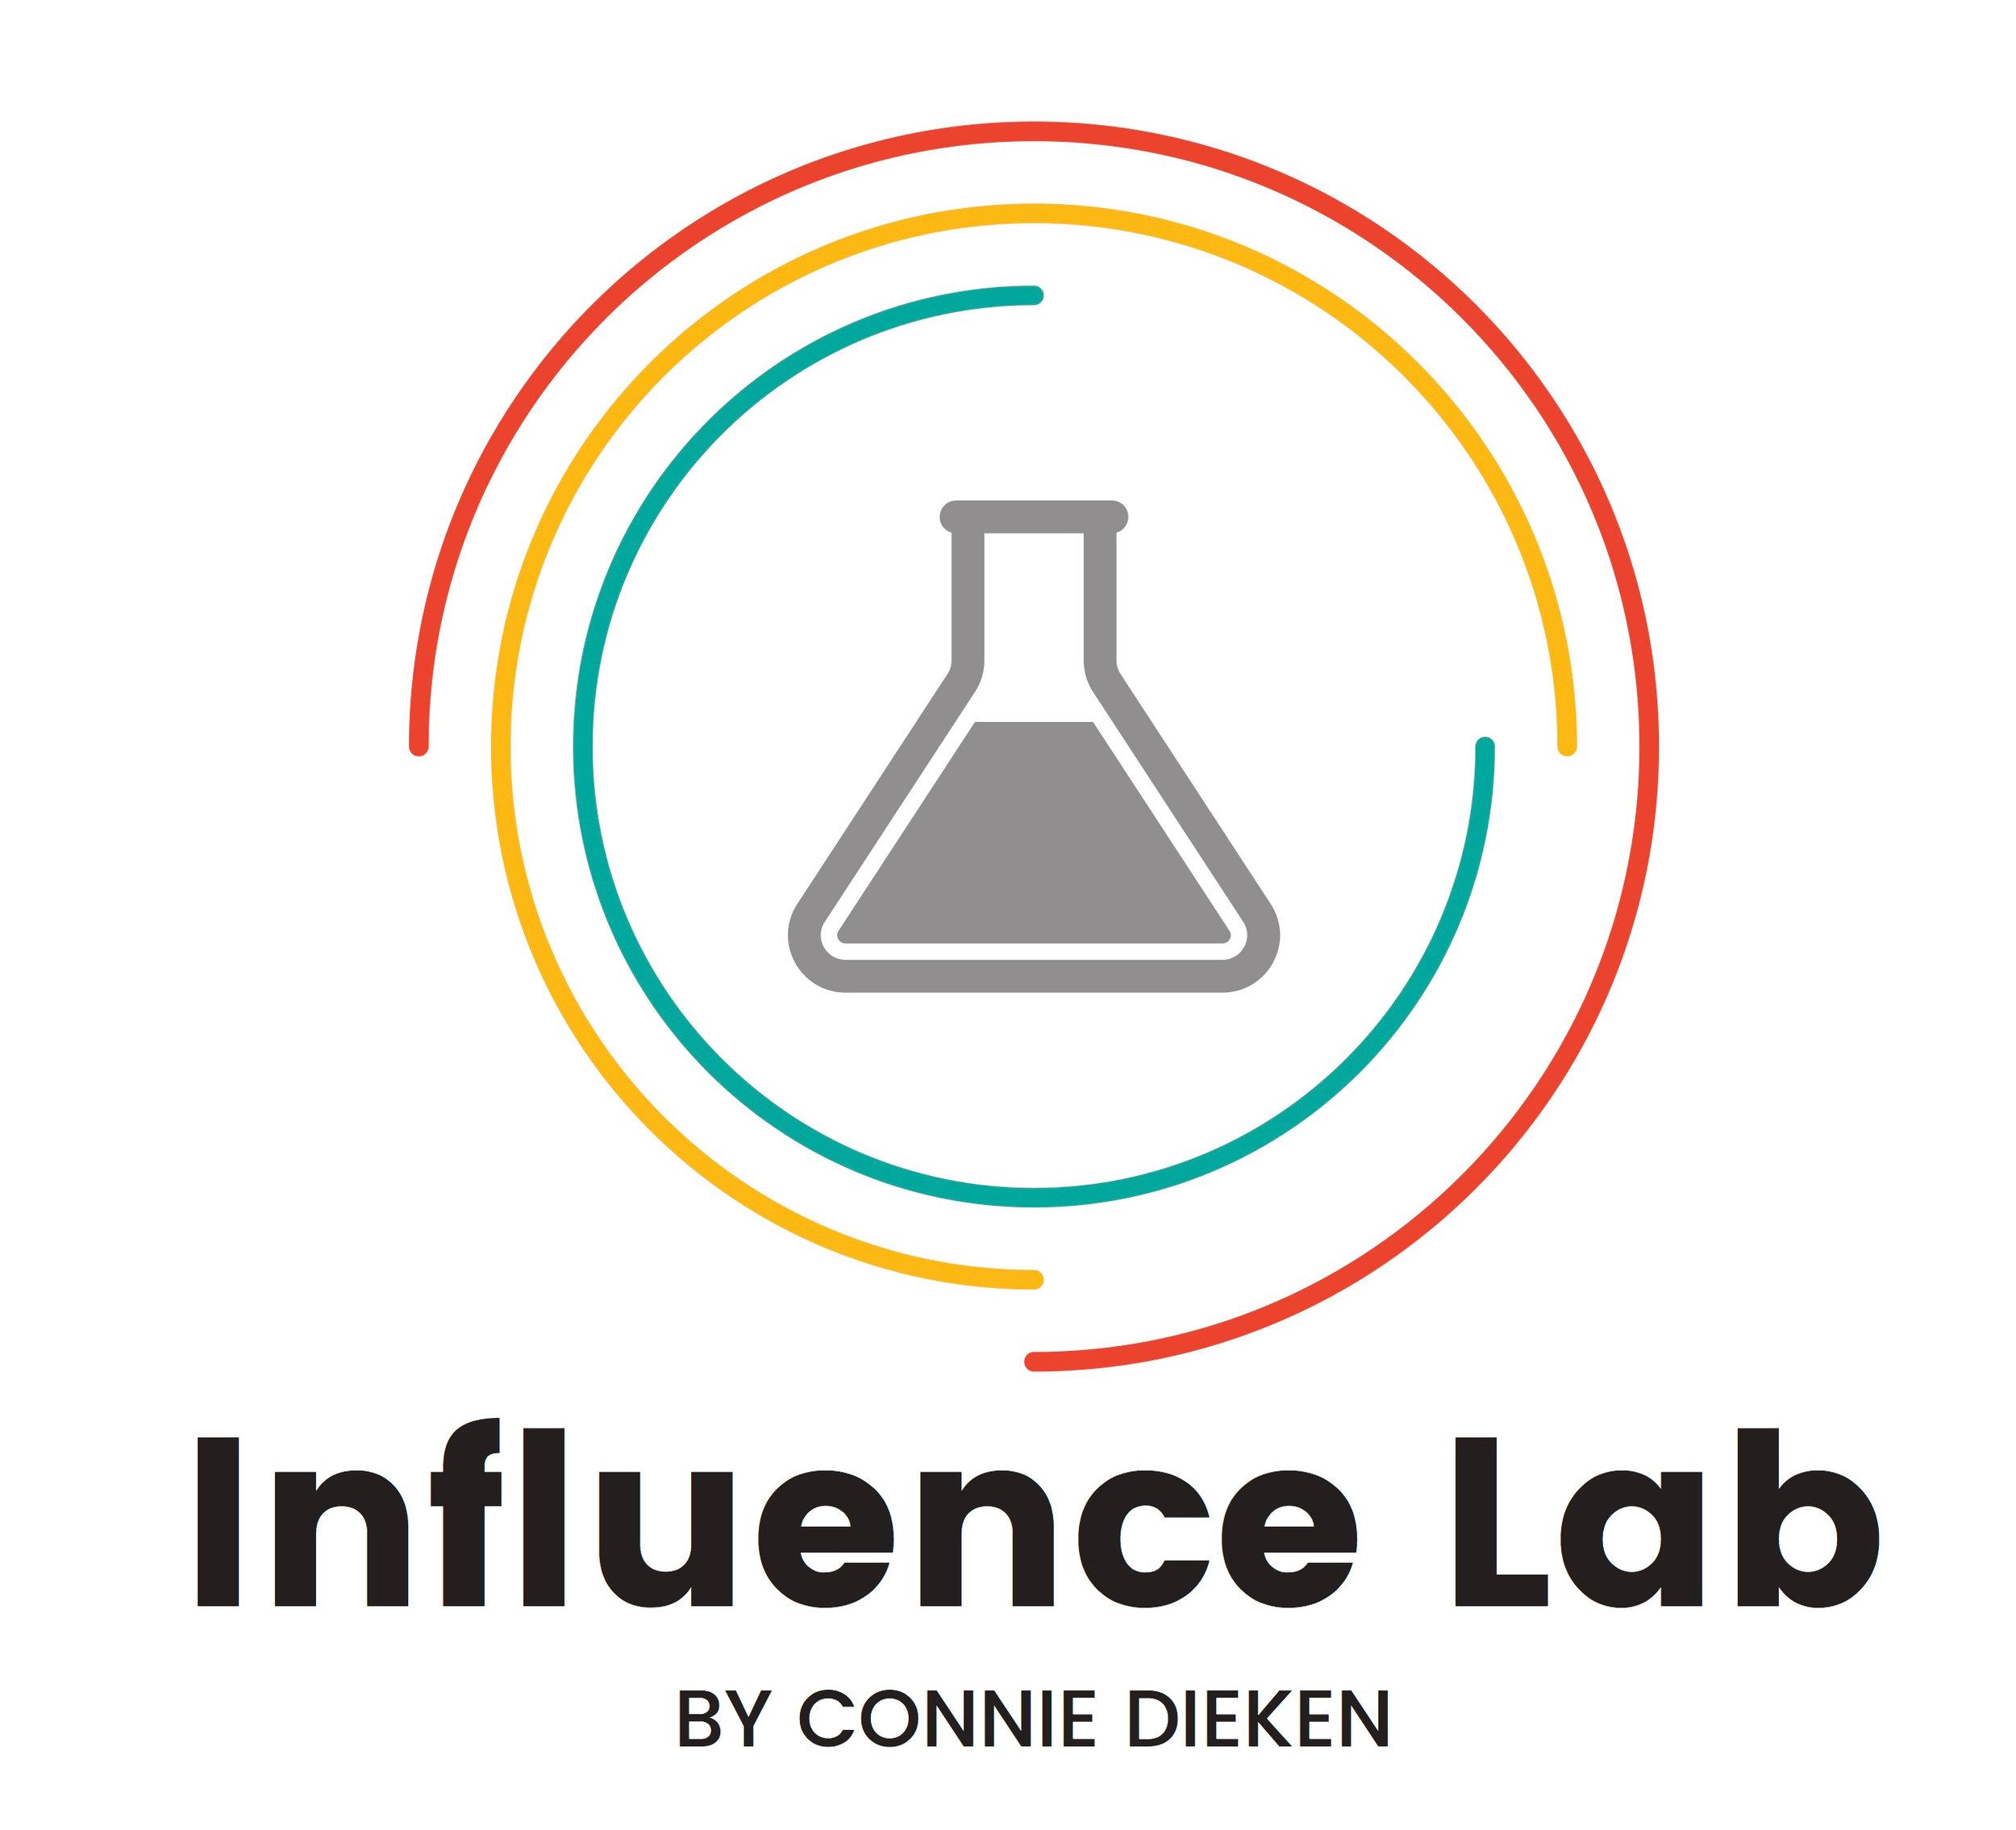 influence-lab.jpg